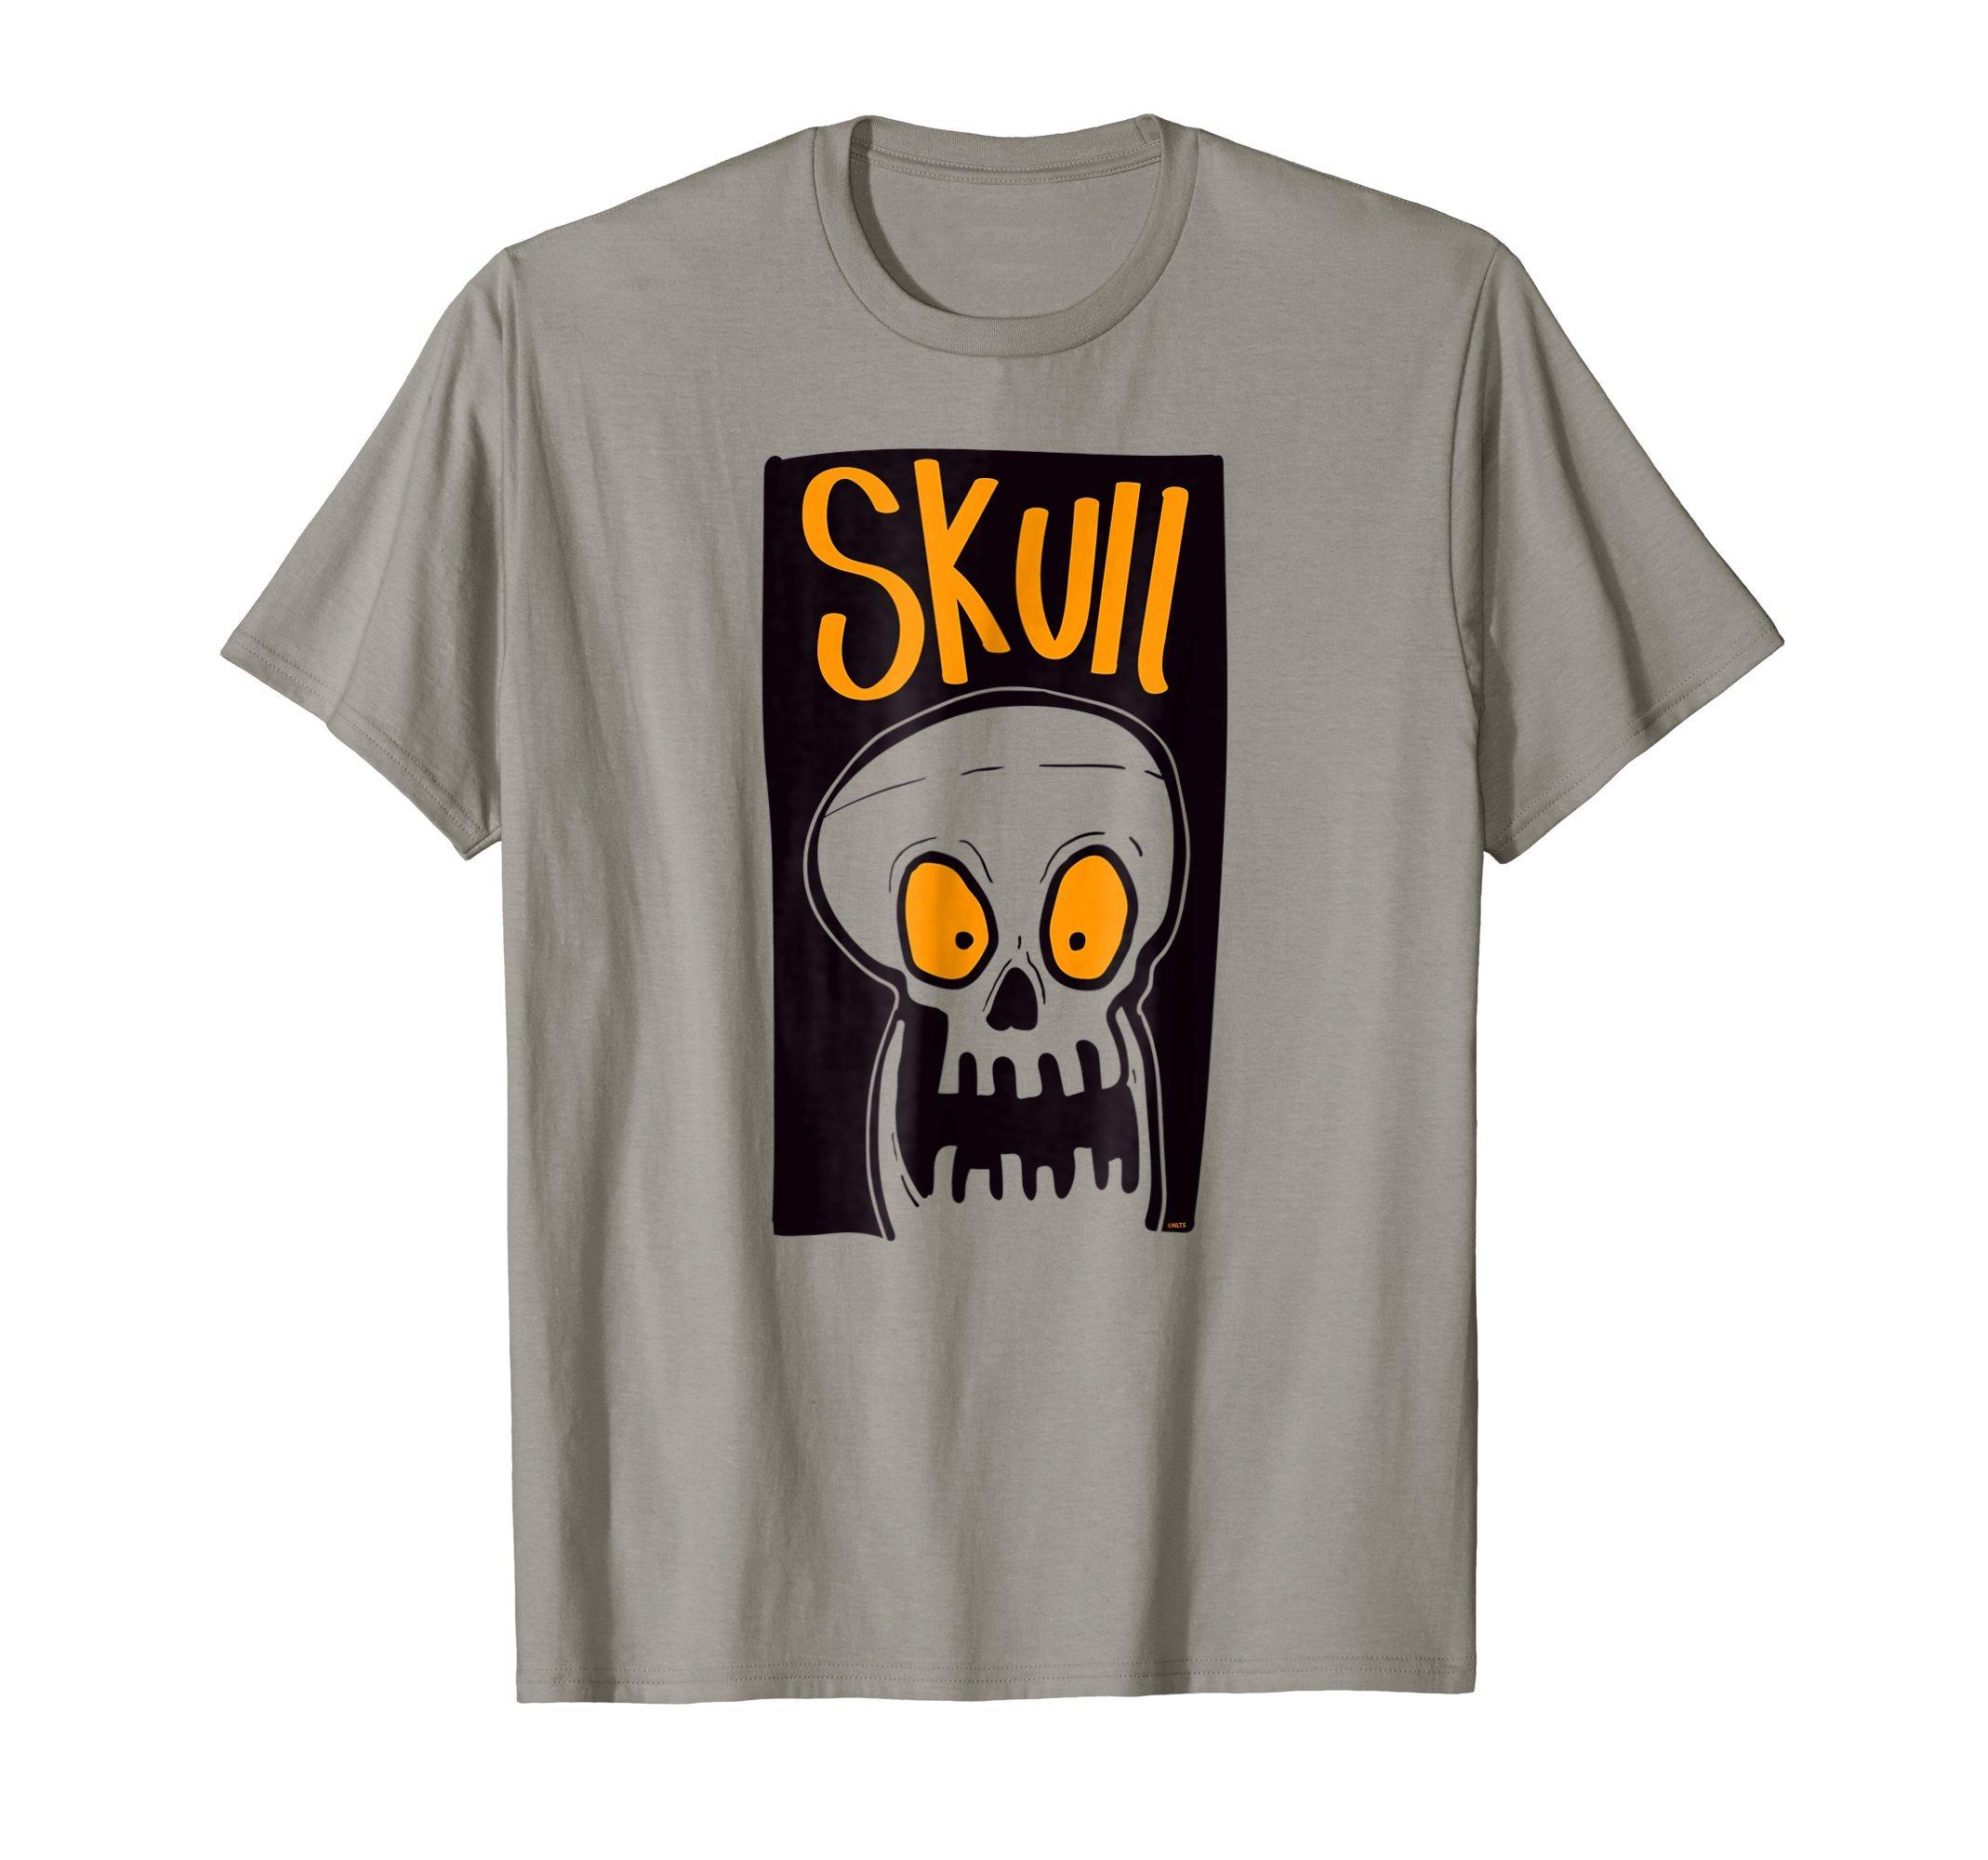 Scared-Skull-Halloween-costume-T-Shirt-Tee-Gift